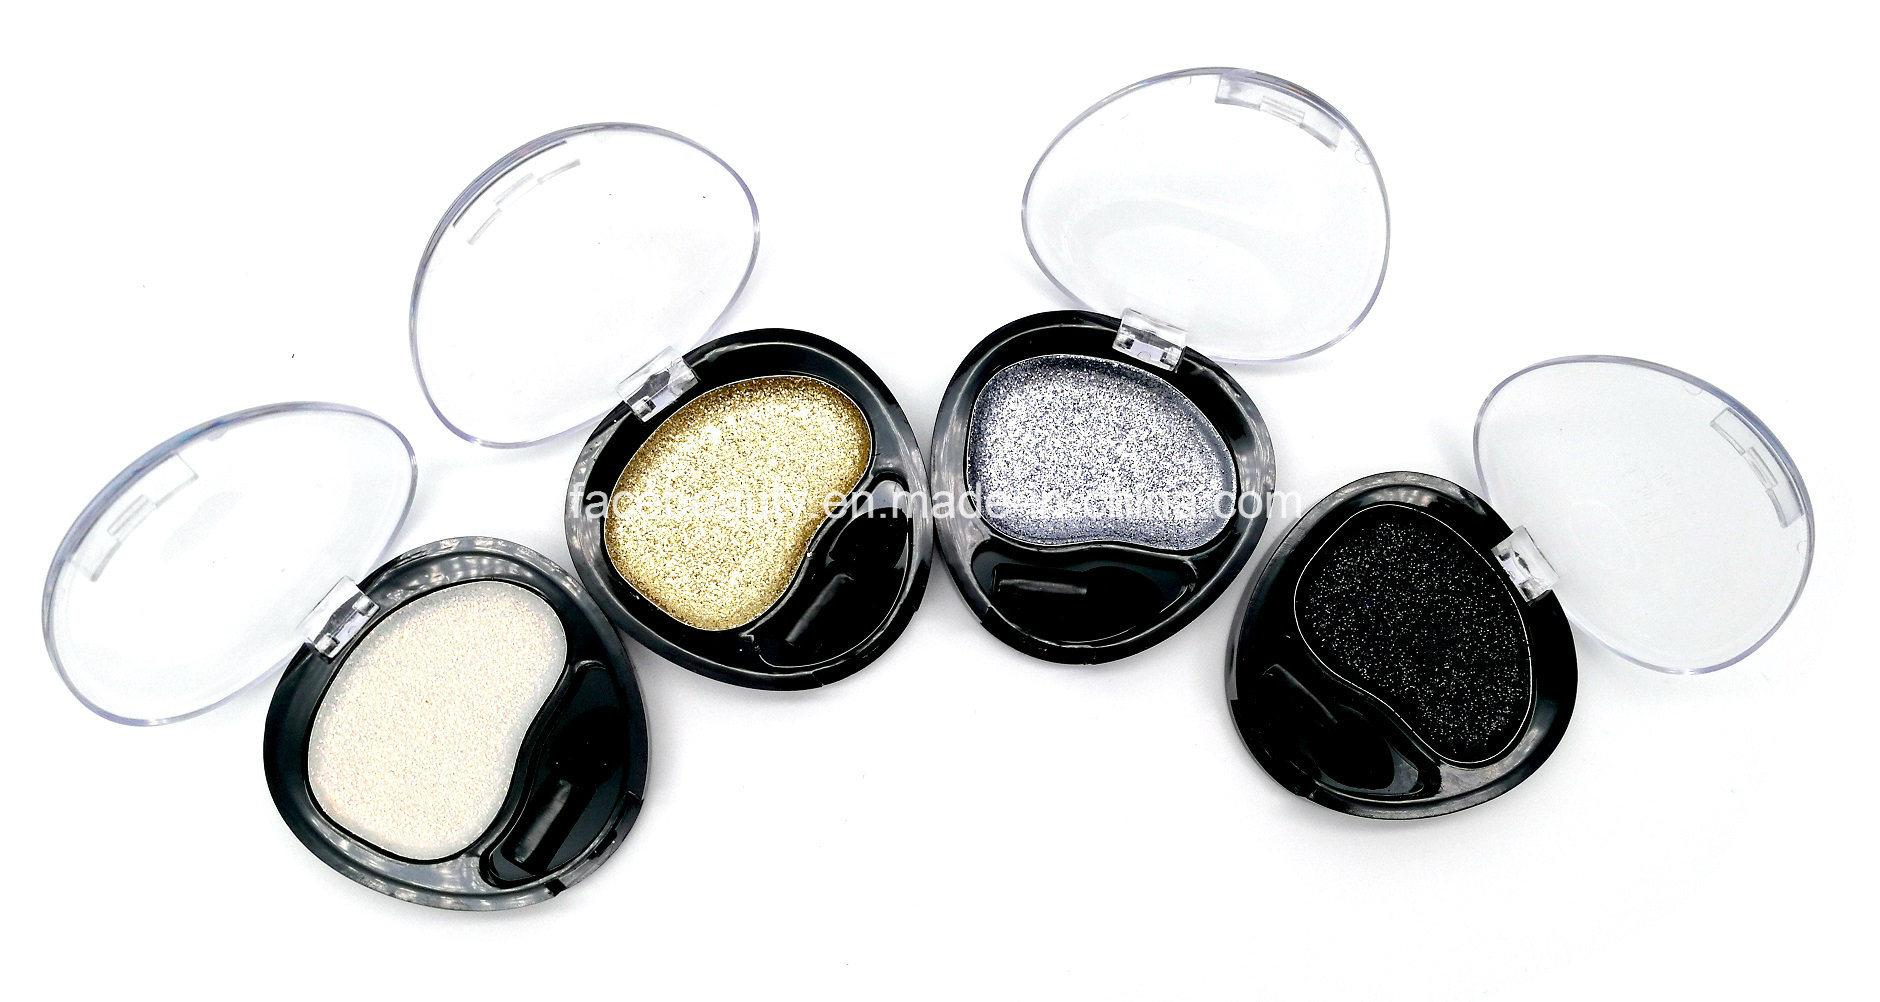 4 Groups Color Fashion Premium Customized High Quality Shining Glitter Eyeshadow Gel